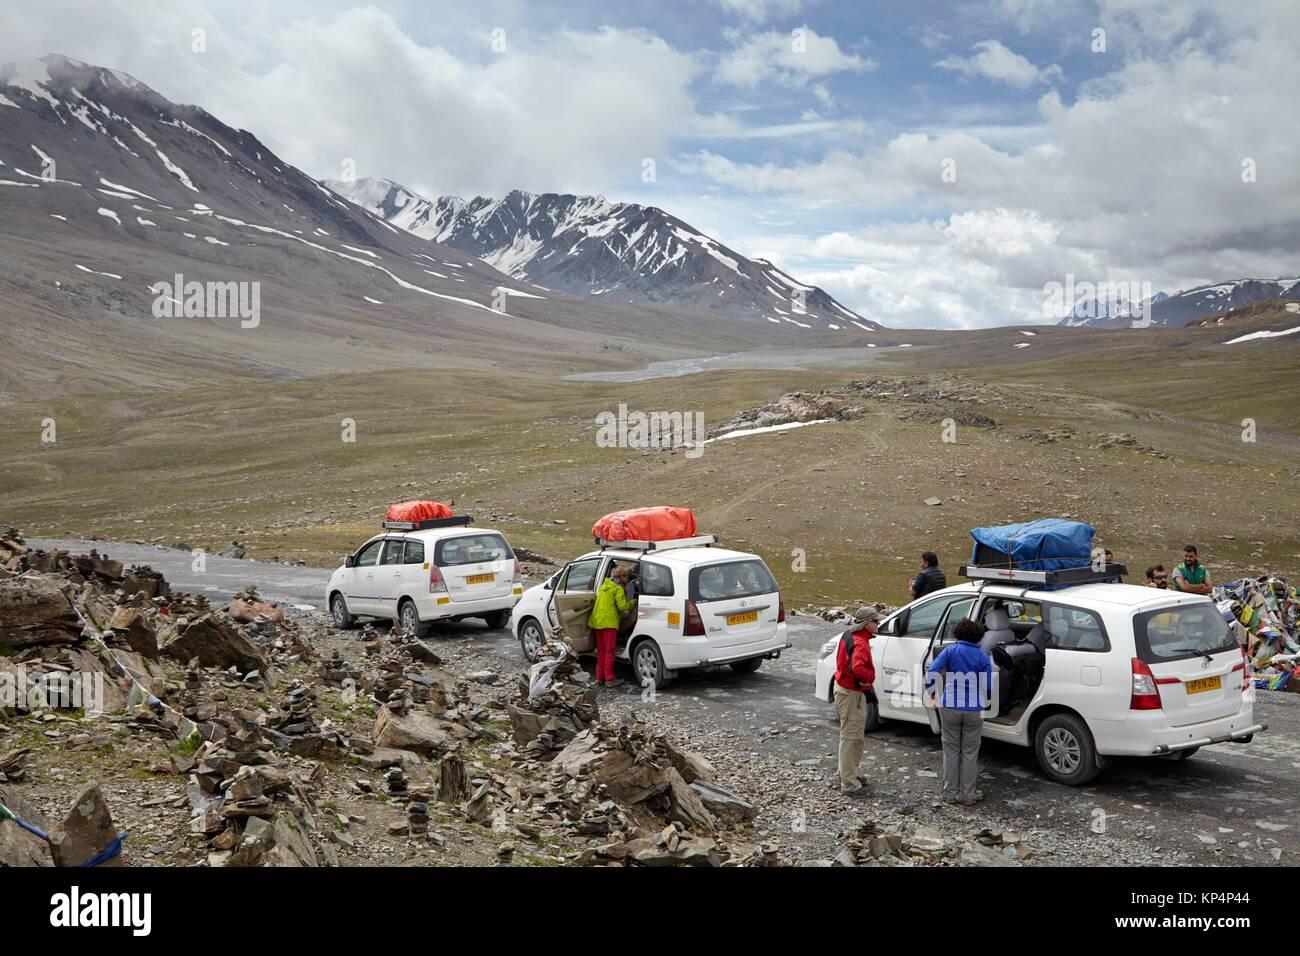 Baralacha Pass, Himachal Pradesh, India. - Stock Image